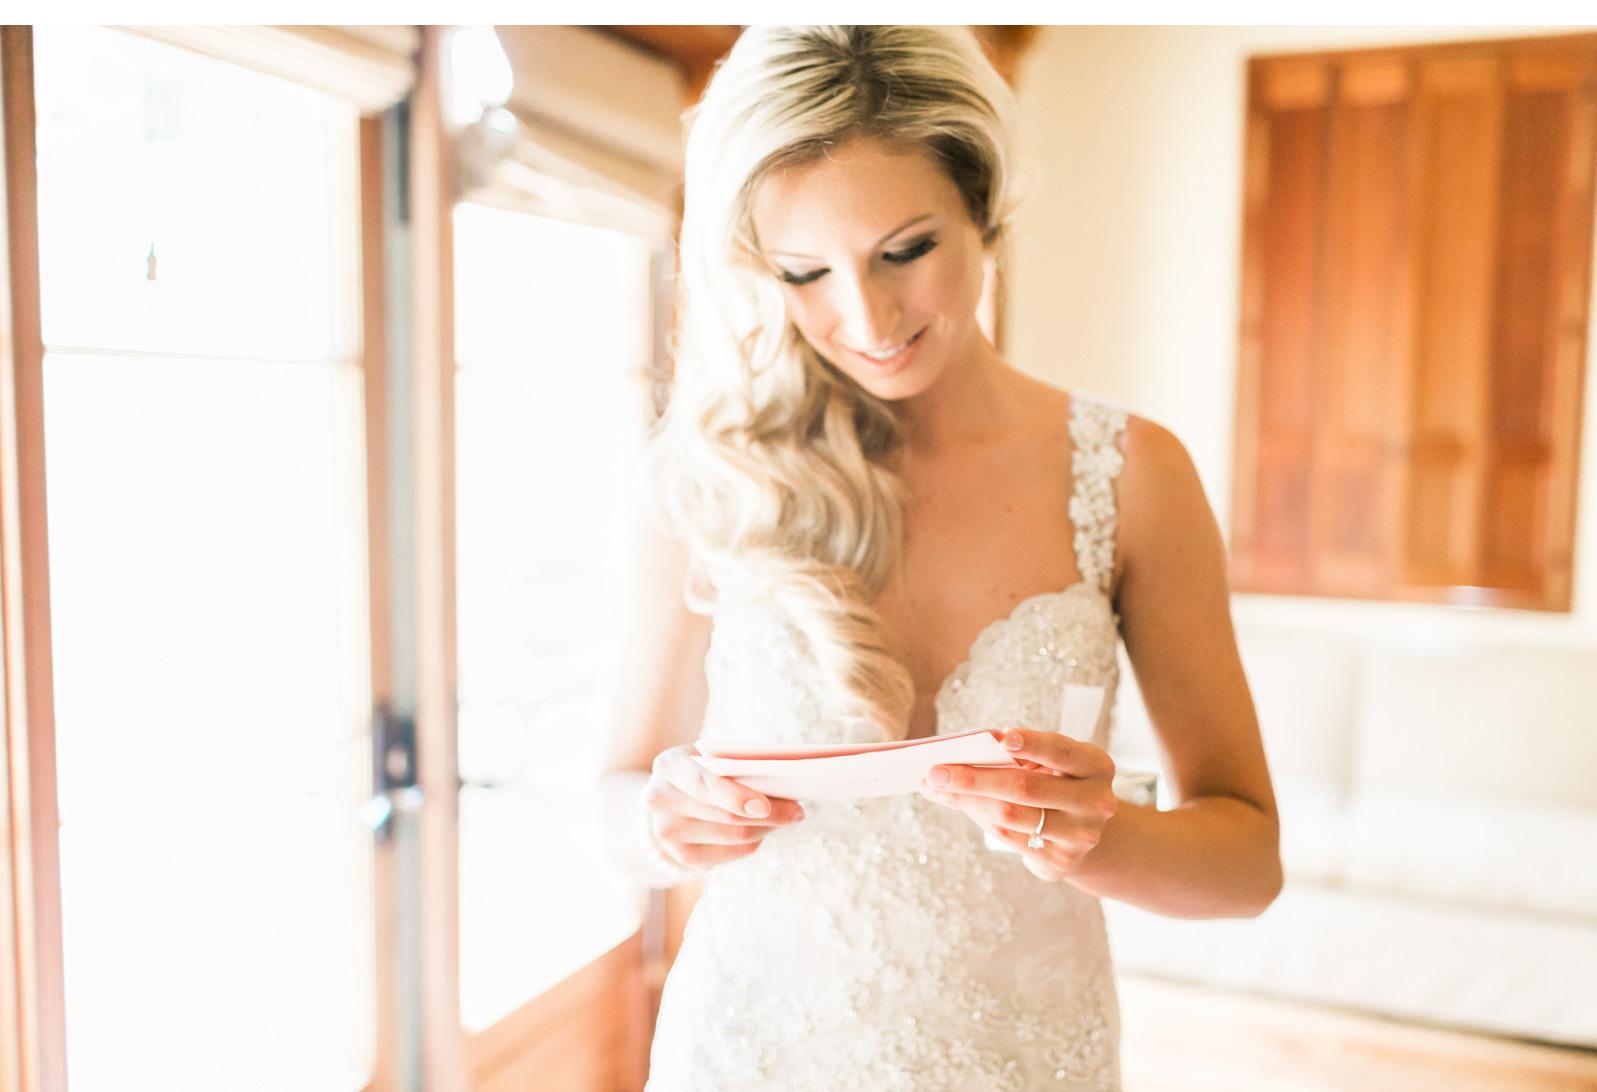 Southern-California-Wedding-Photographer-Natalie-Schutt-Photography_08.jpg